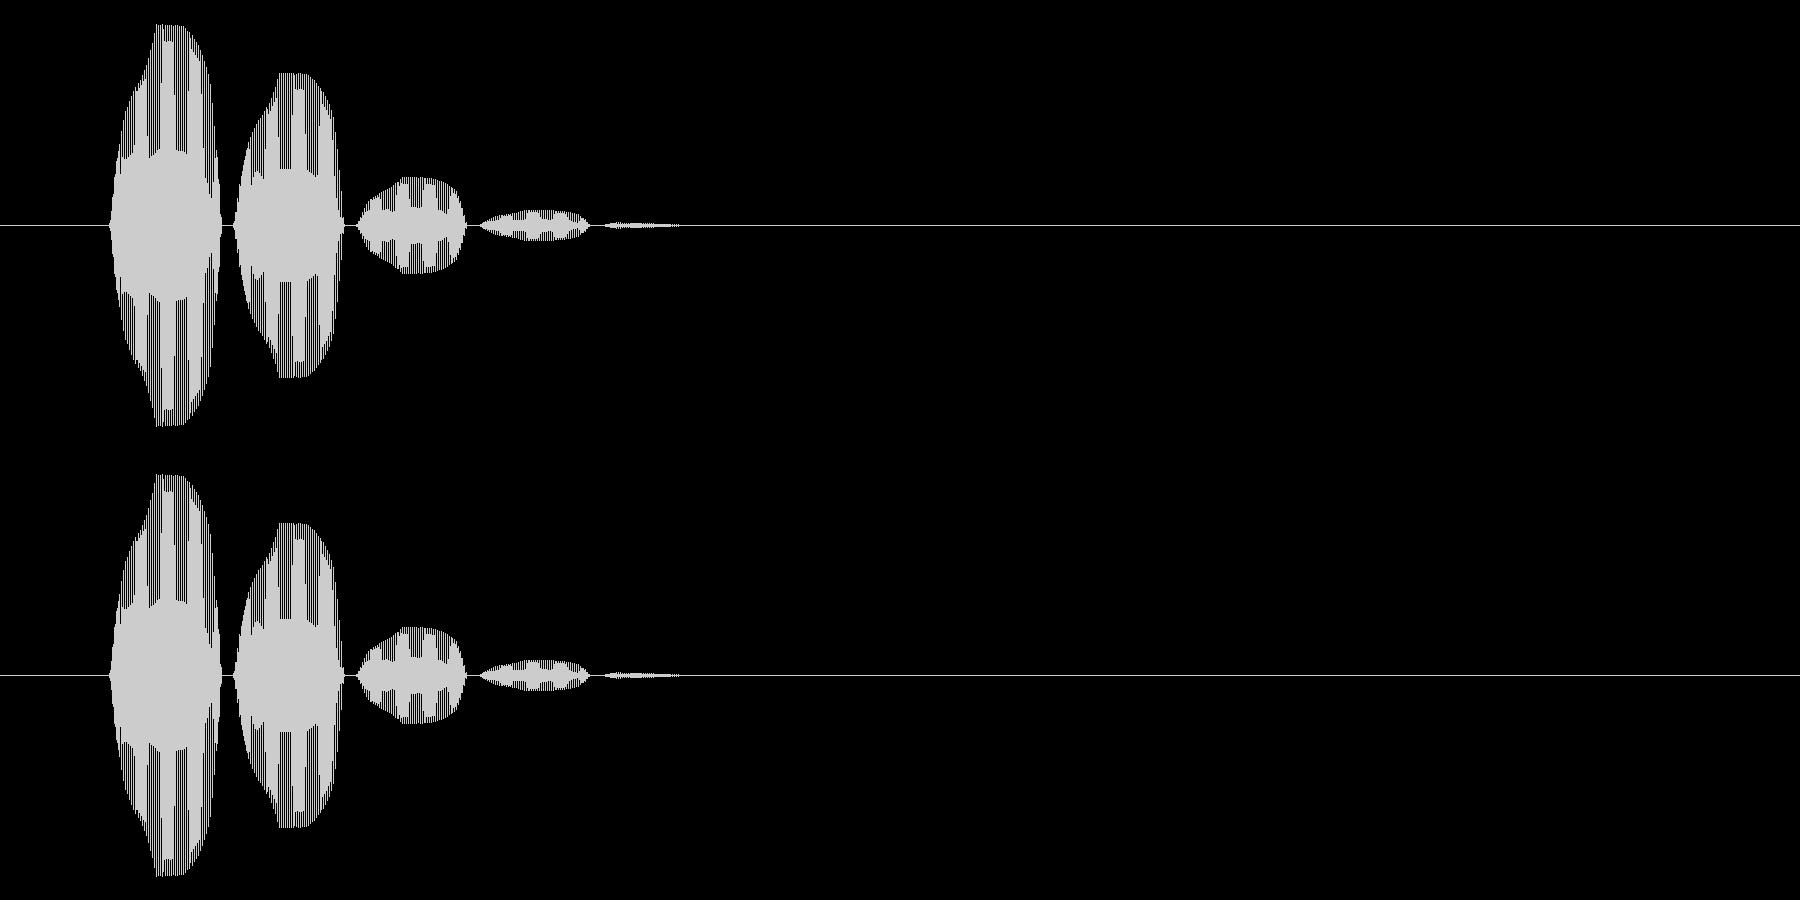 SNES 格闘05-10(選択)の未再生の波形